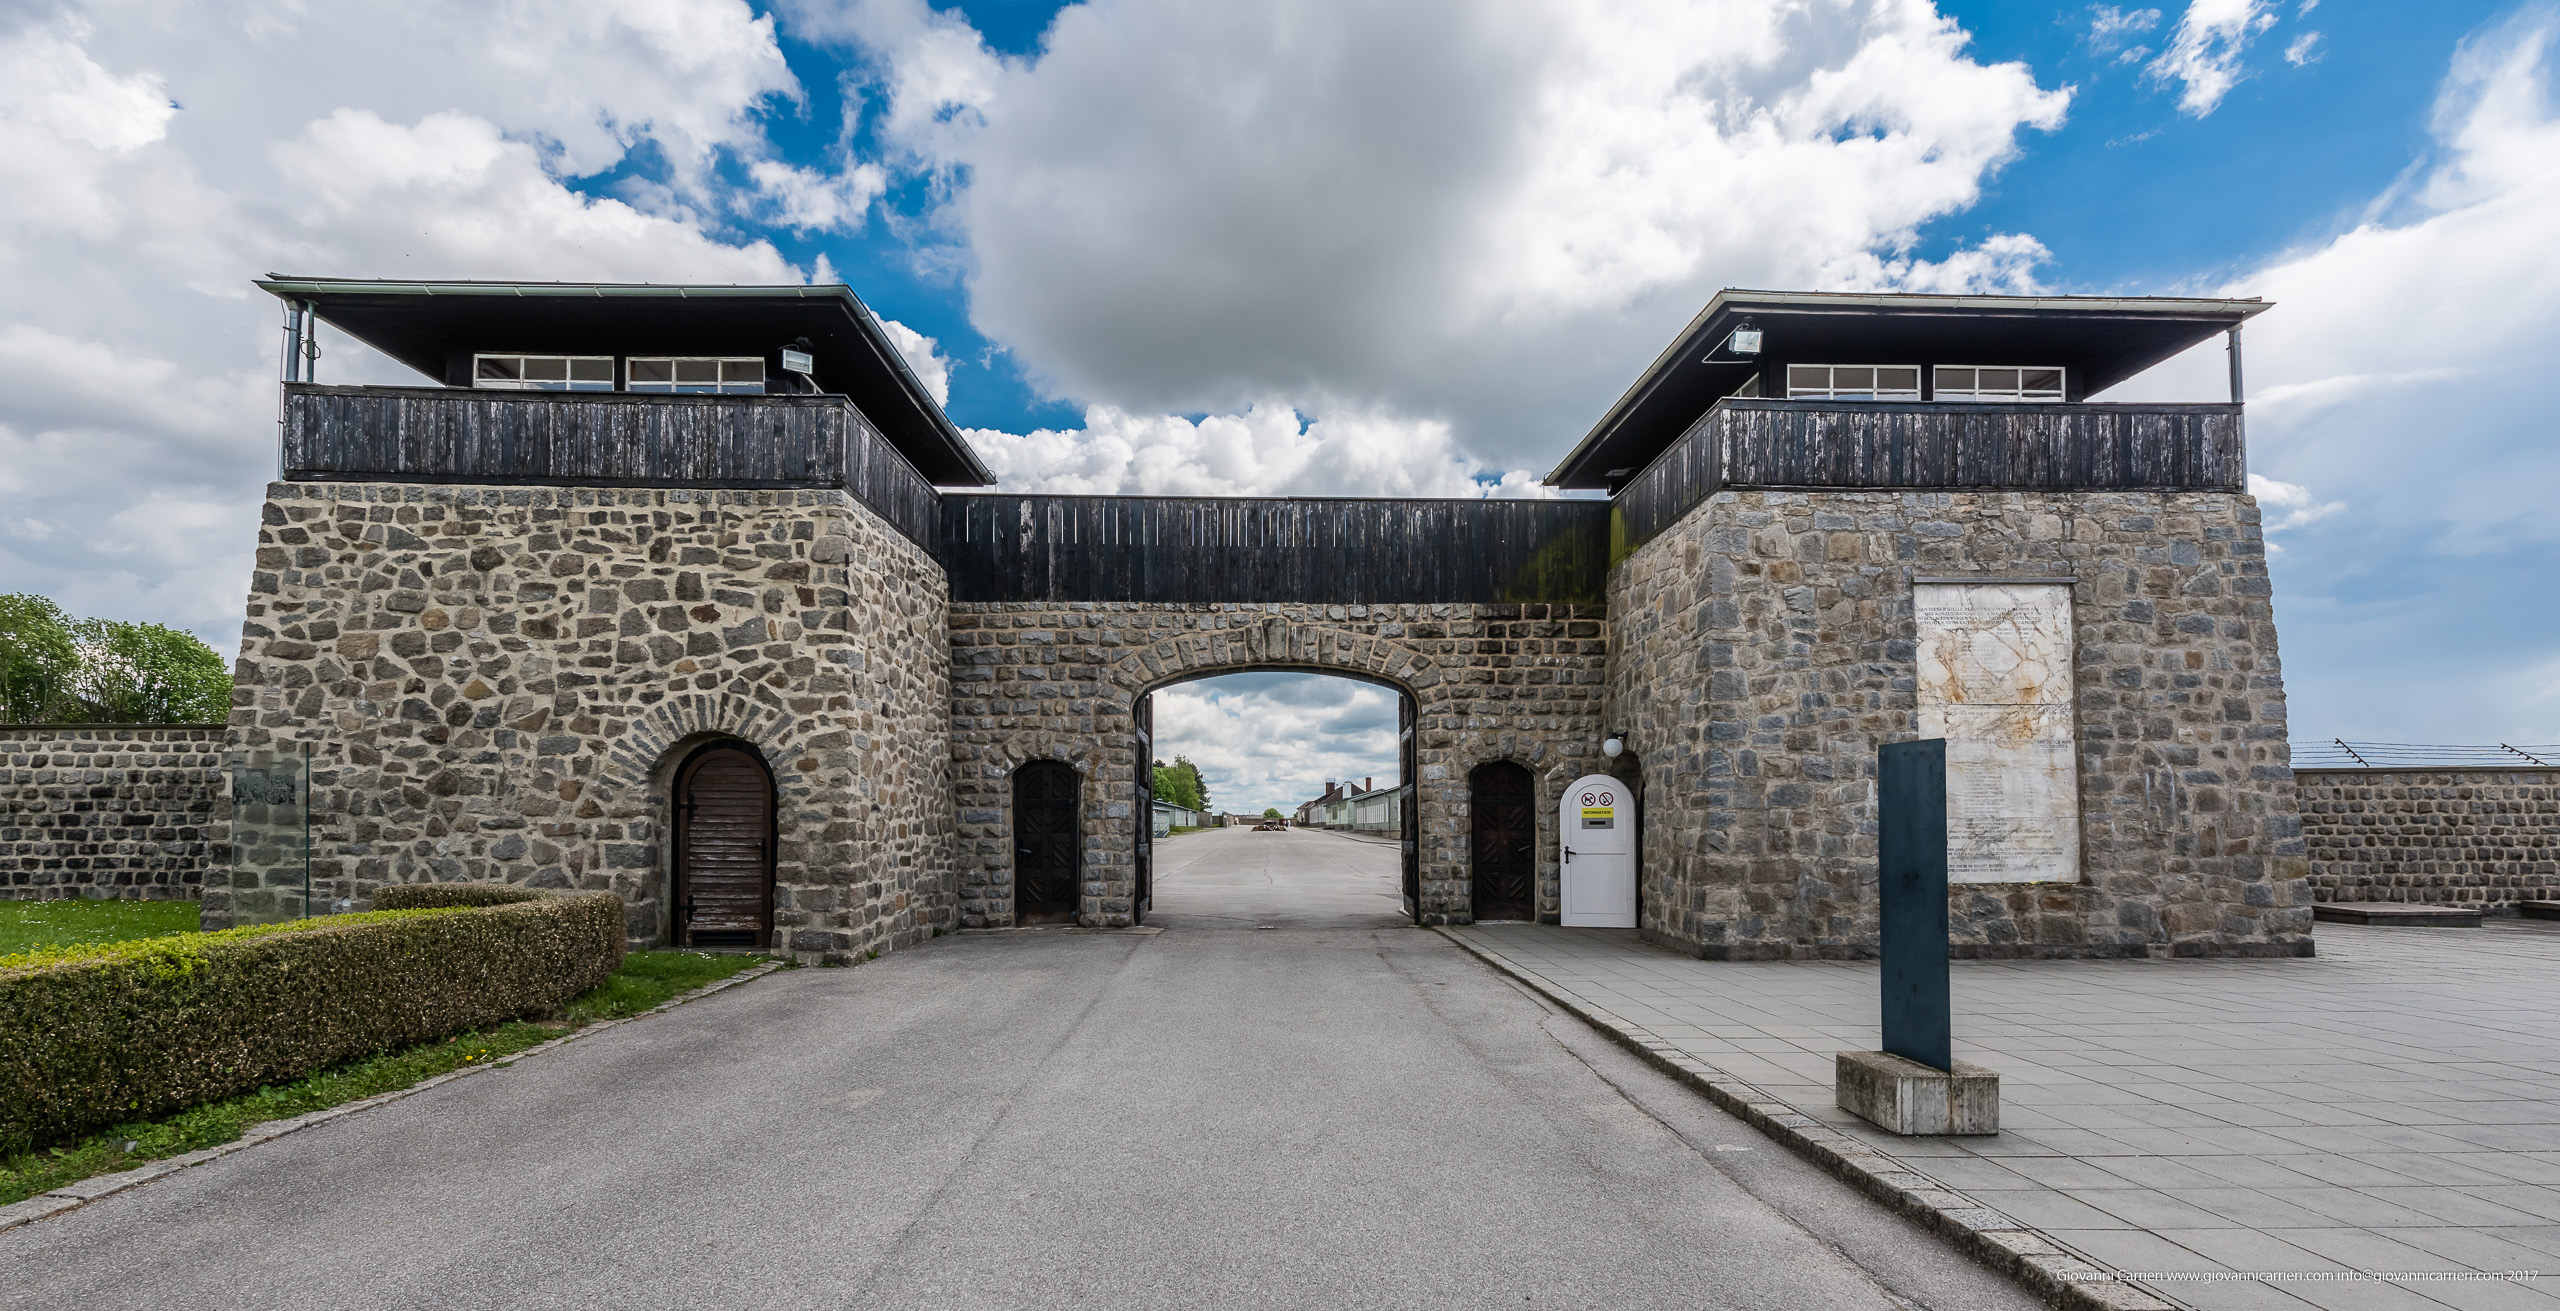 KZ Mauthausen concentration camp